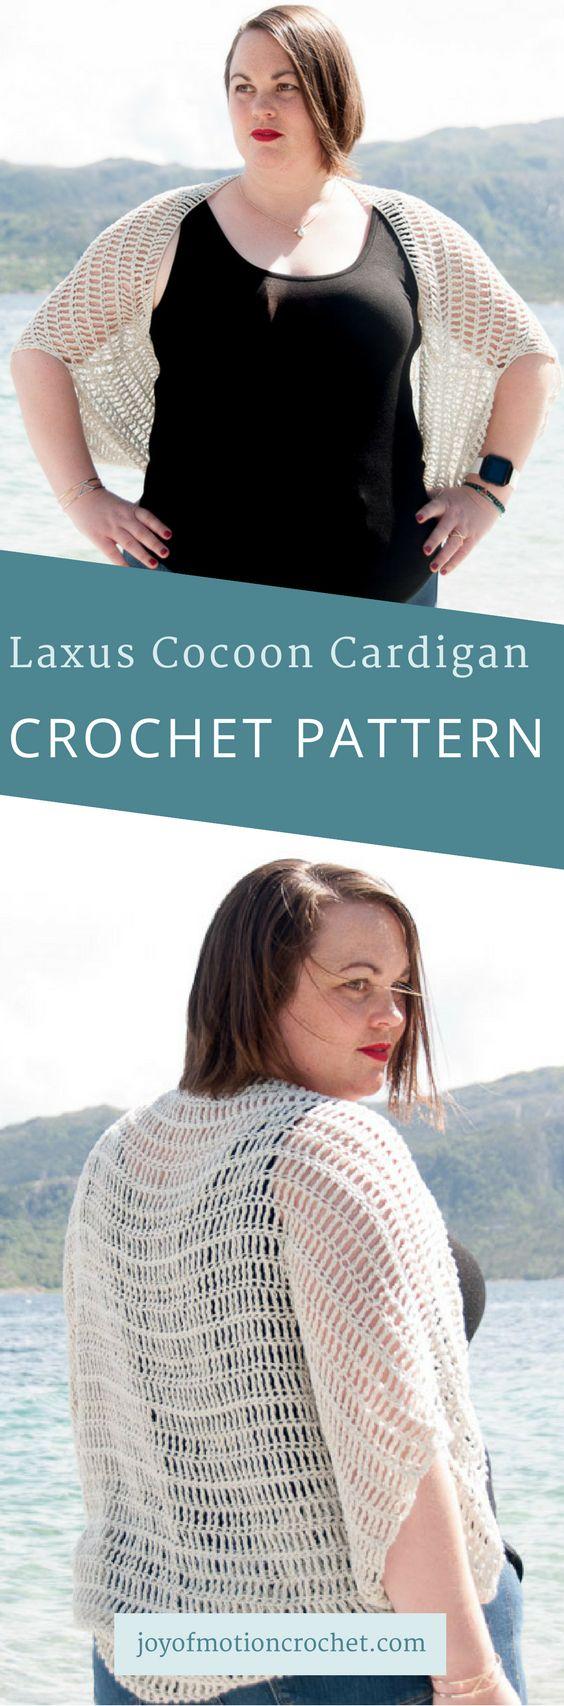 Crochet Cardigan. Crochet wrap. Crochet jacket. Crochet garment. Beginner crochet pattern.  #crochetpattern #crochetcardigan #crochet #crochetgarment #crochetclothing